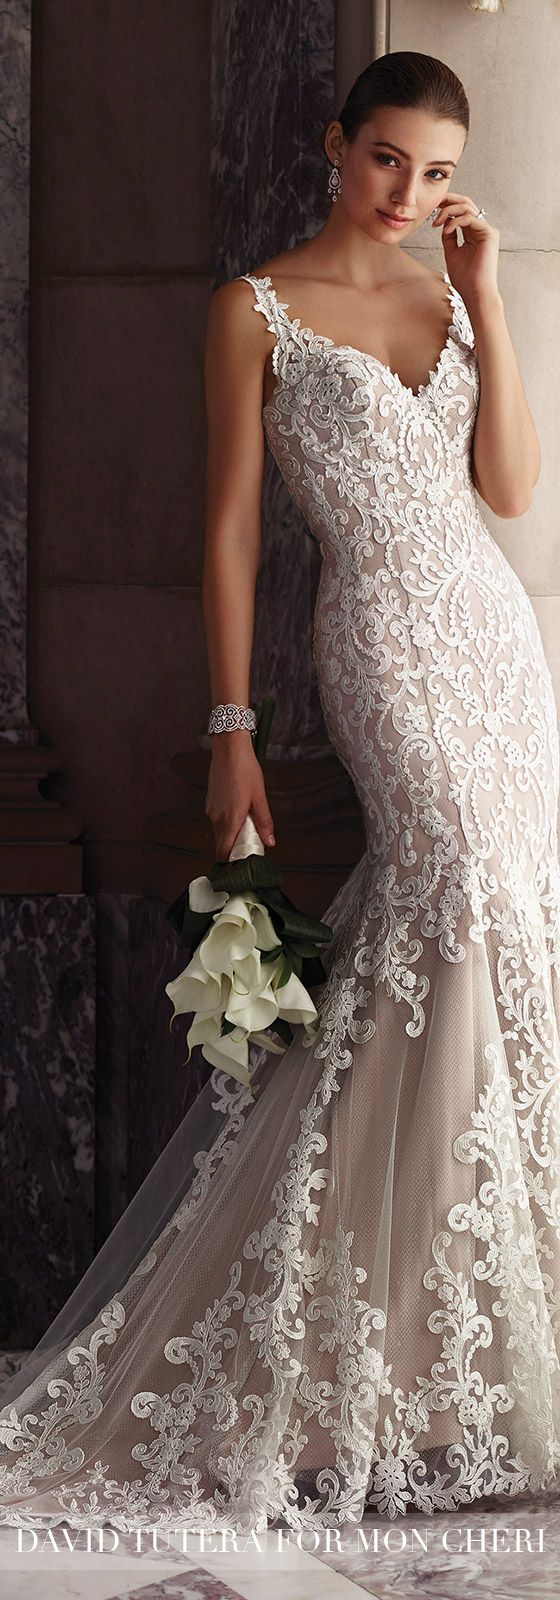 Fancy Sleeveless Fit u Flare Lace Wedding Dress Amber